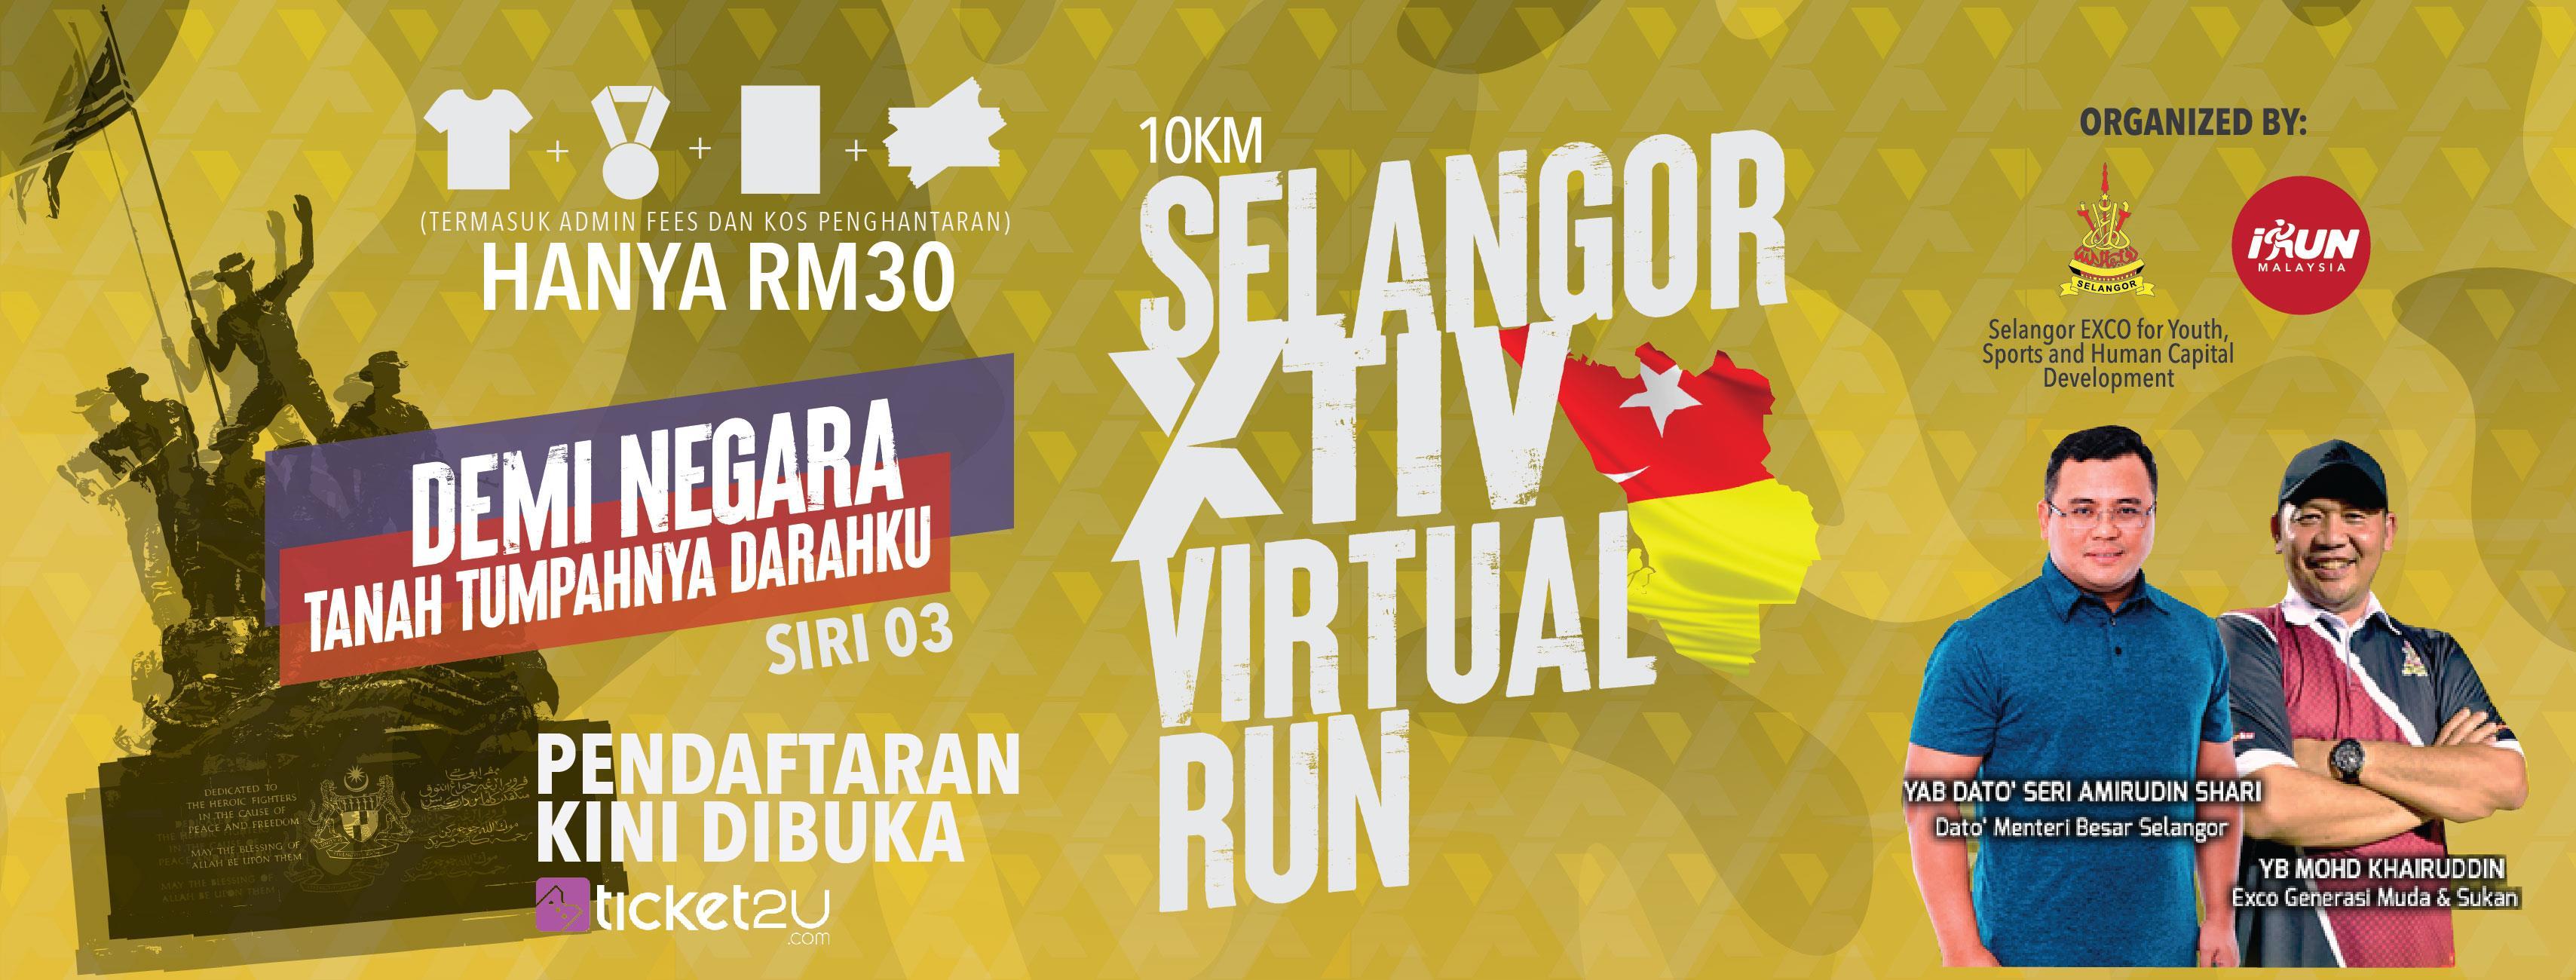 Selangor XTIV Virtual Run Merdeka Edition (iRUN Virtual)